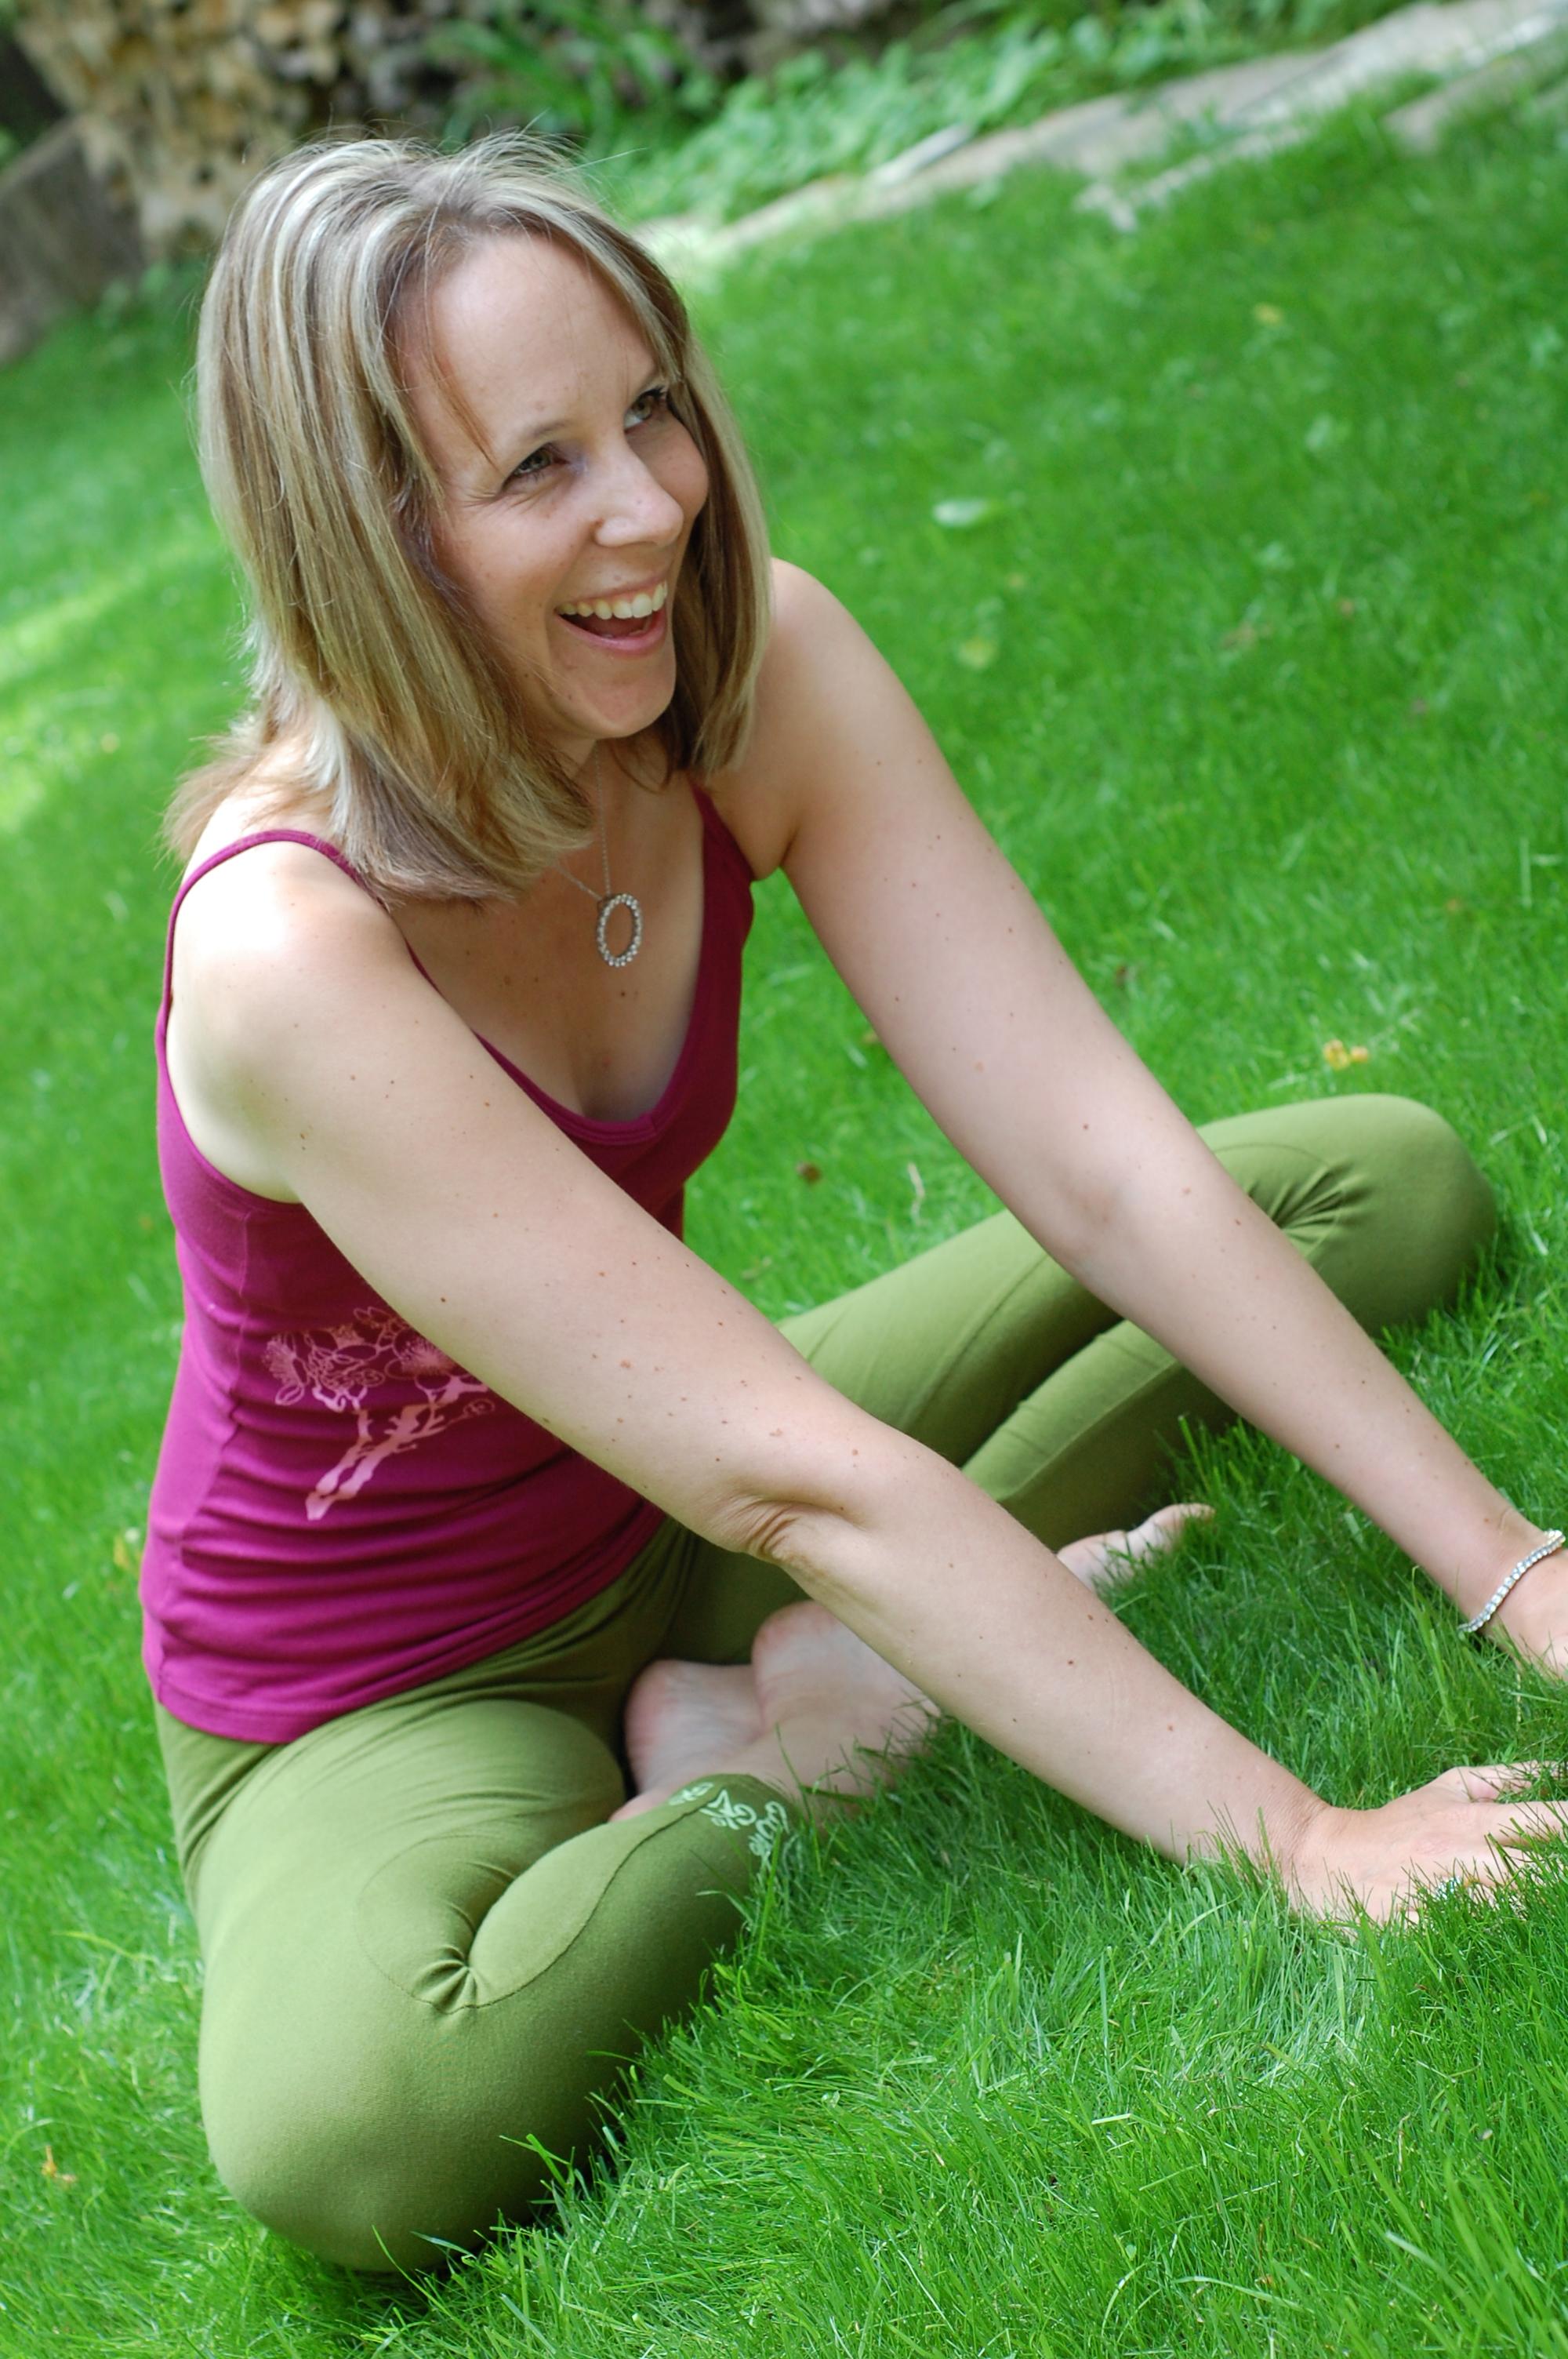 alittleagency melissa  Yoga Videos, Namaste Yoga, Free Online Yoga Videos, About Dr ..